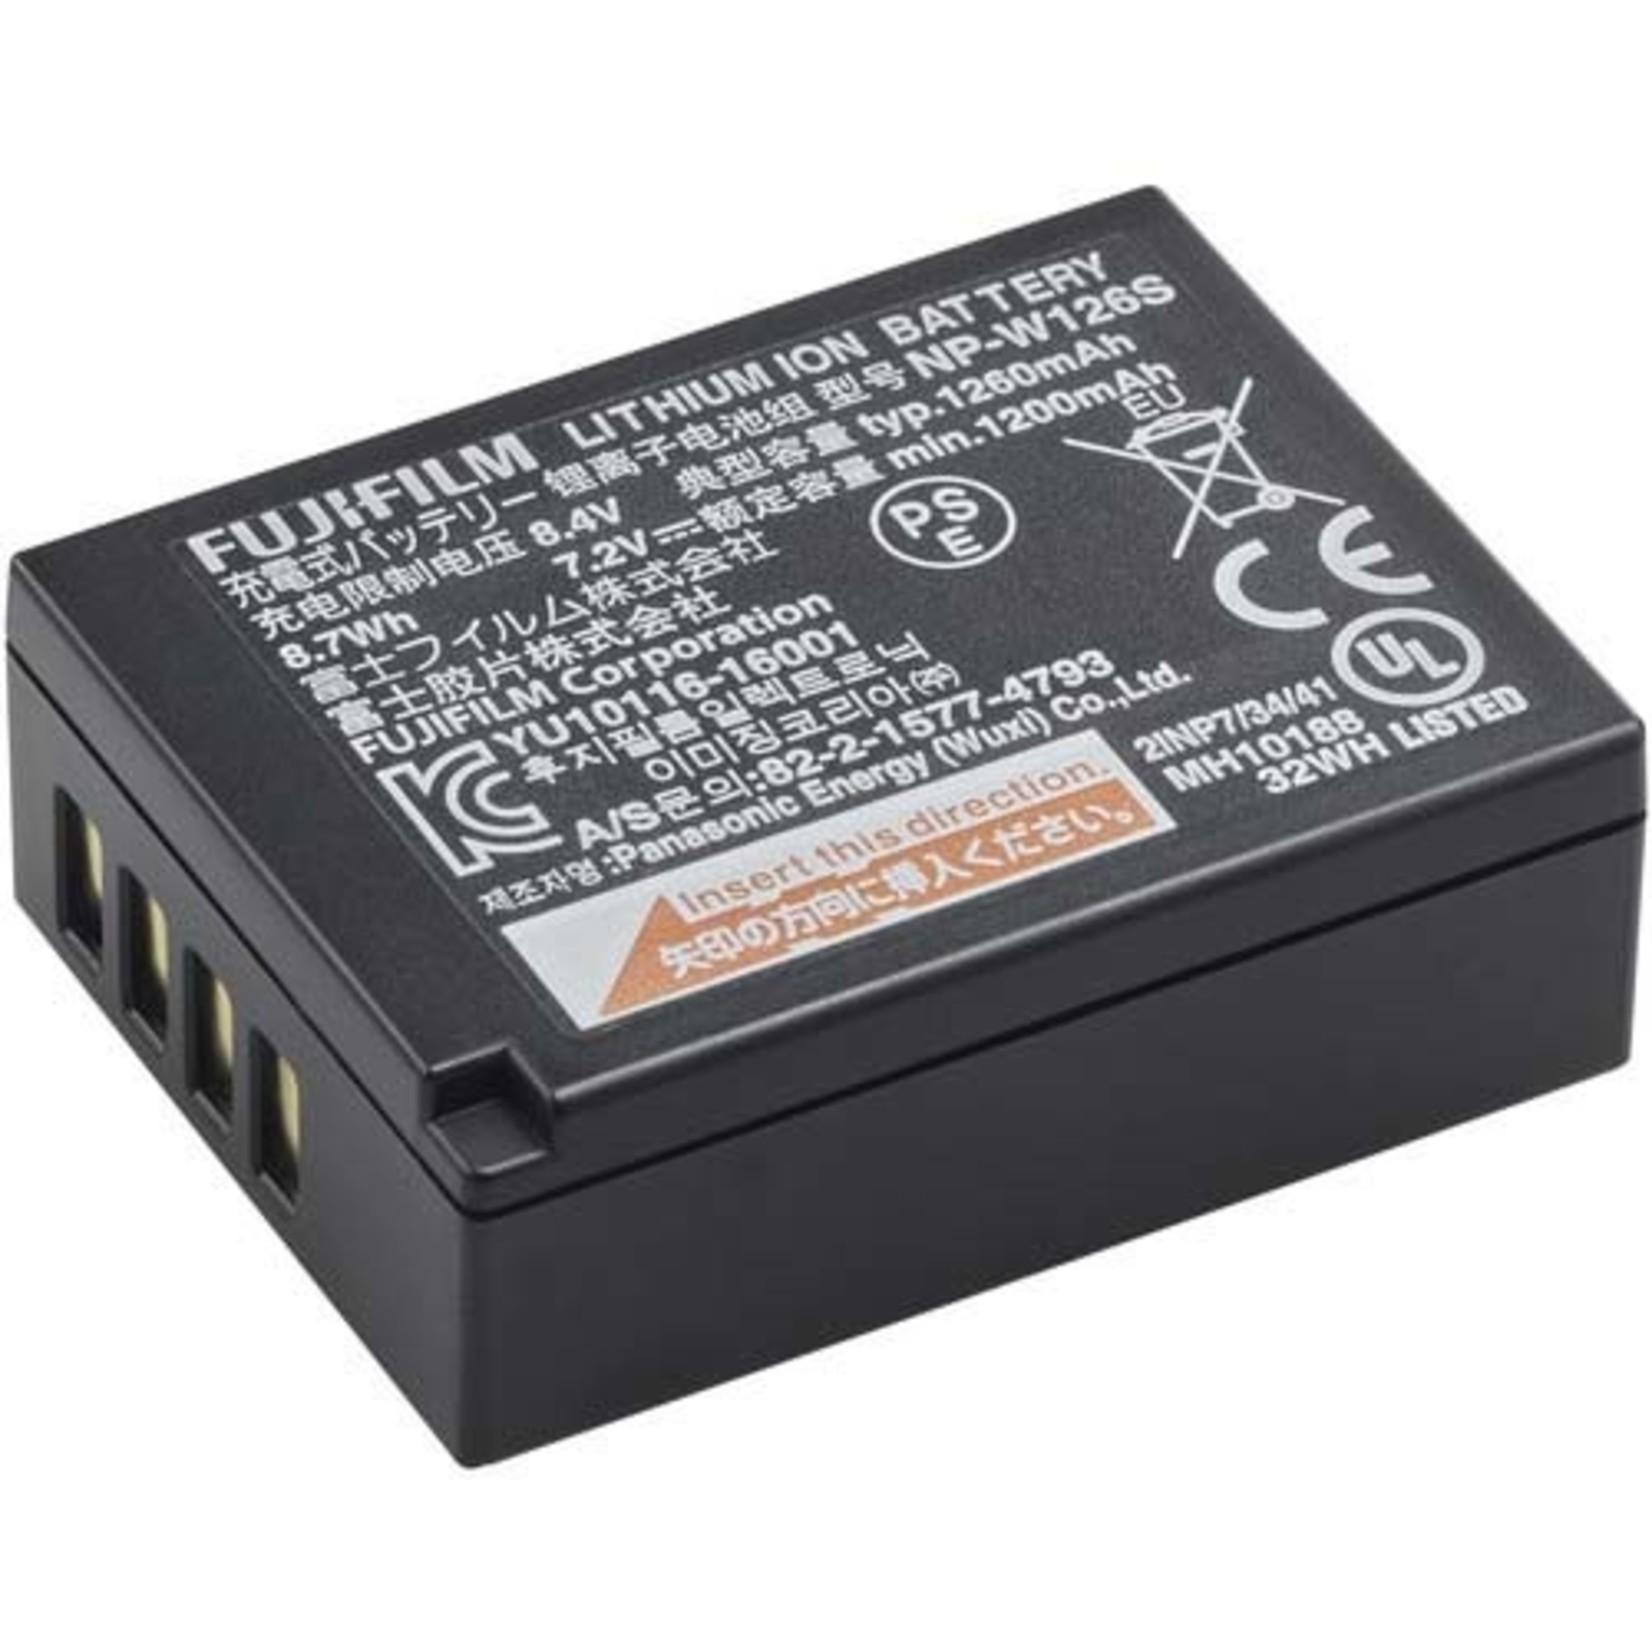 FujiFilm FujiFilm NP-W126s Battery